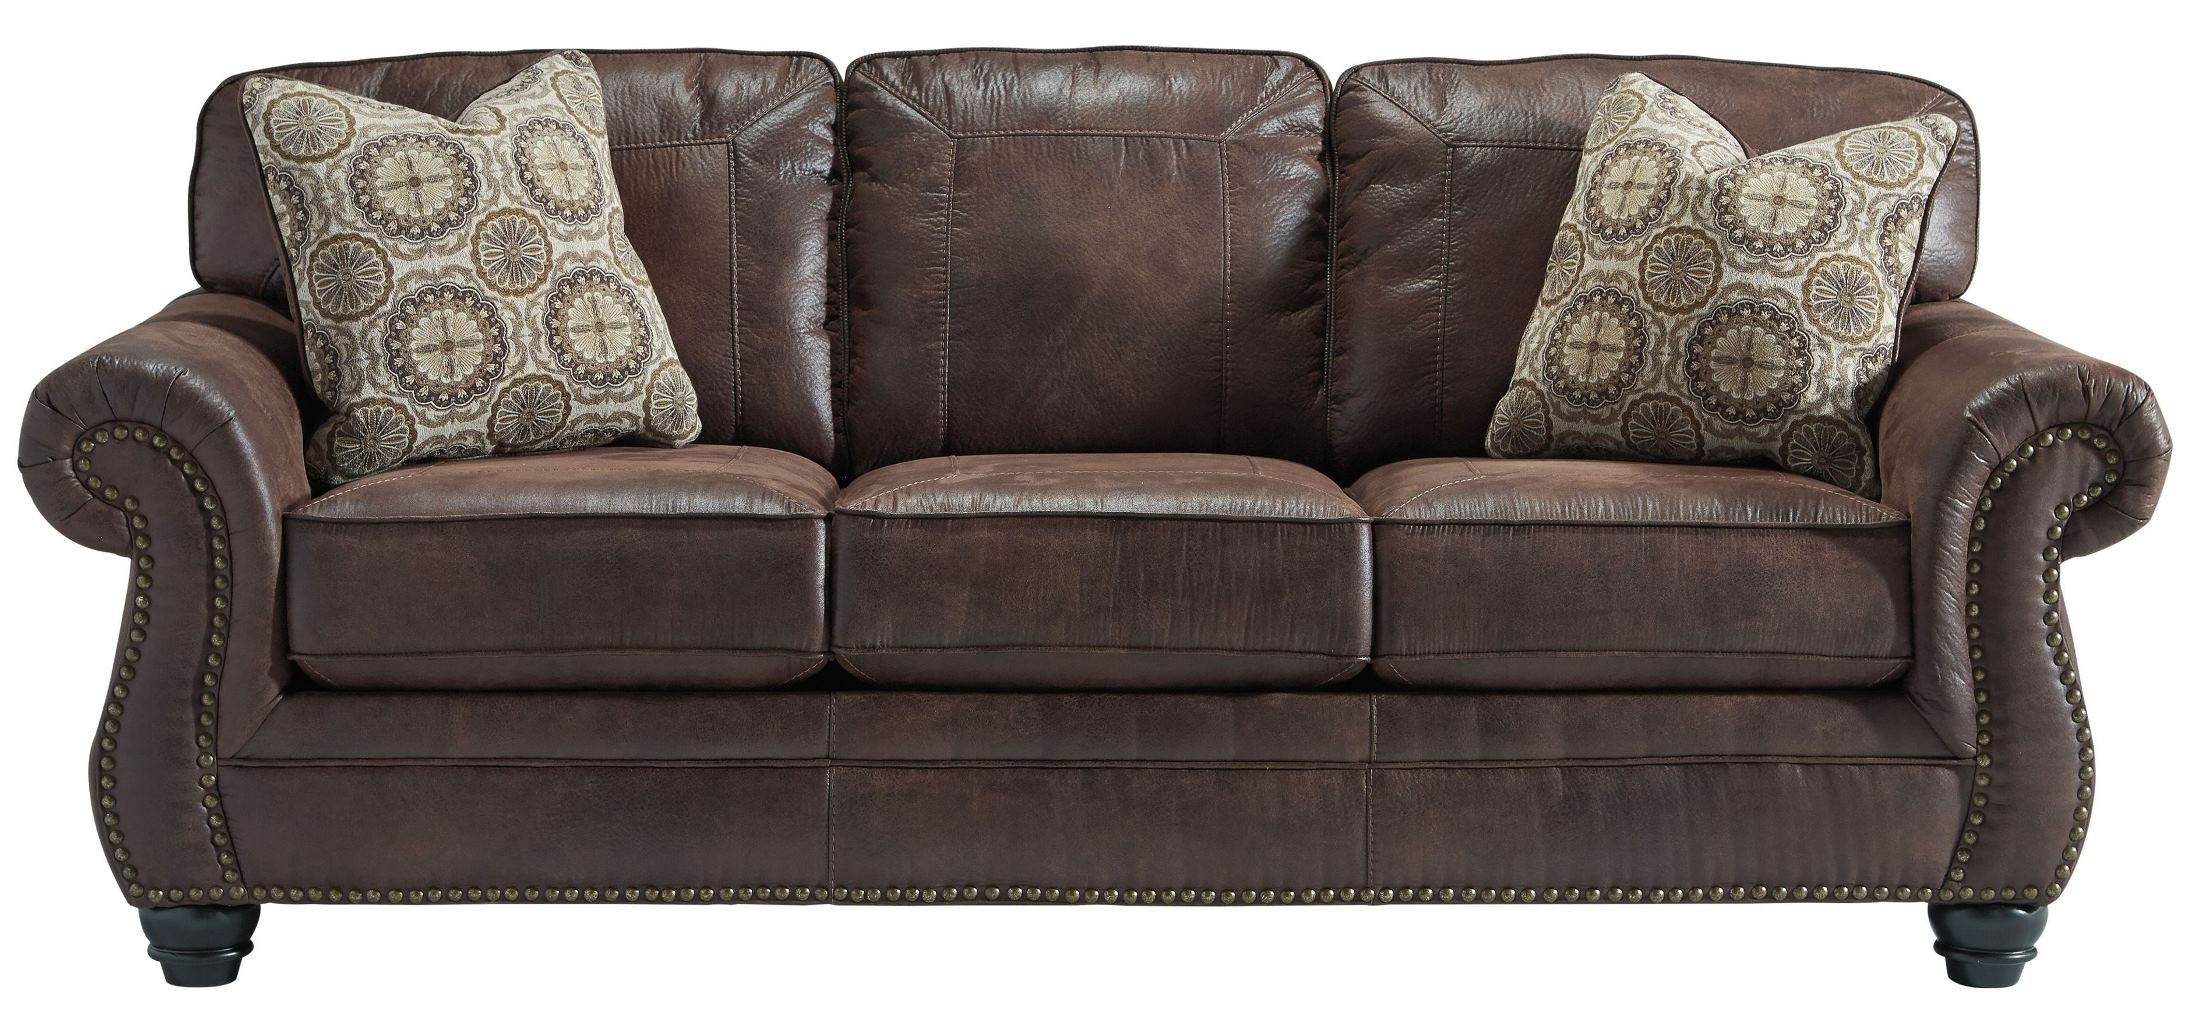 Breville Espresso Stationary Sofa From Ashley 8000338